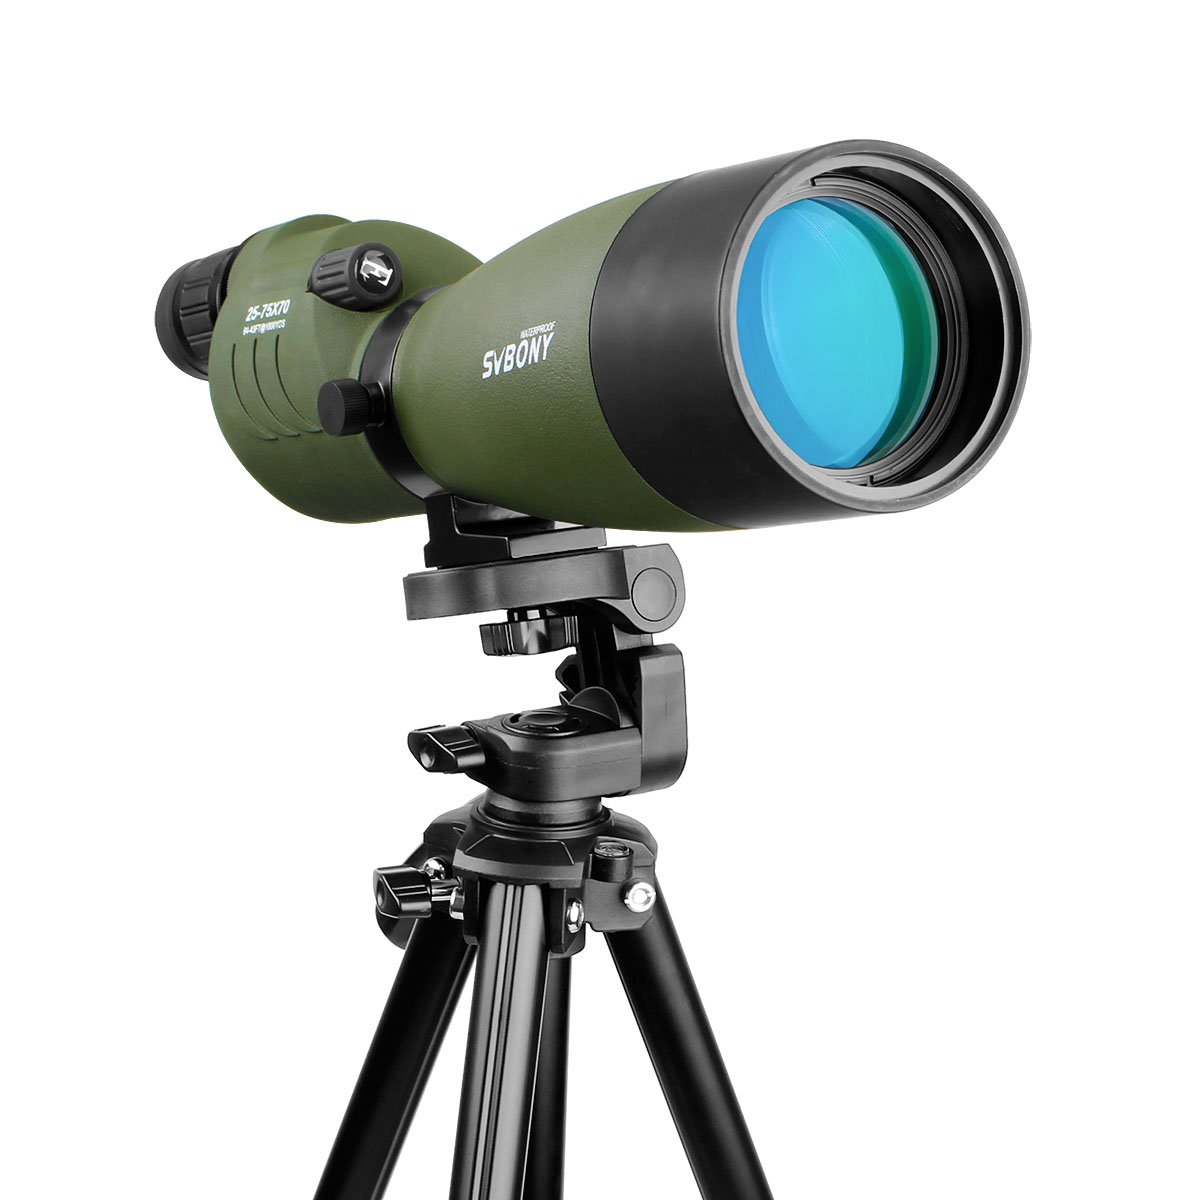 SVBONY SV17 Spotting Scope for Target Shooting Straight scope pic-4